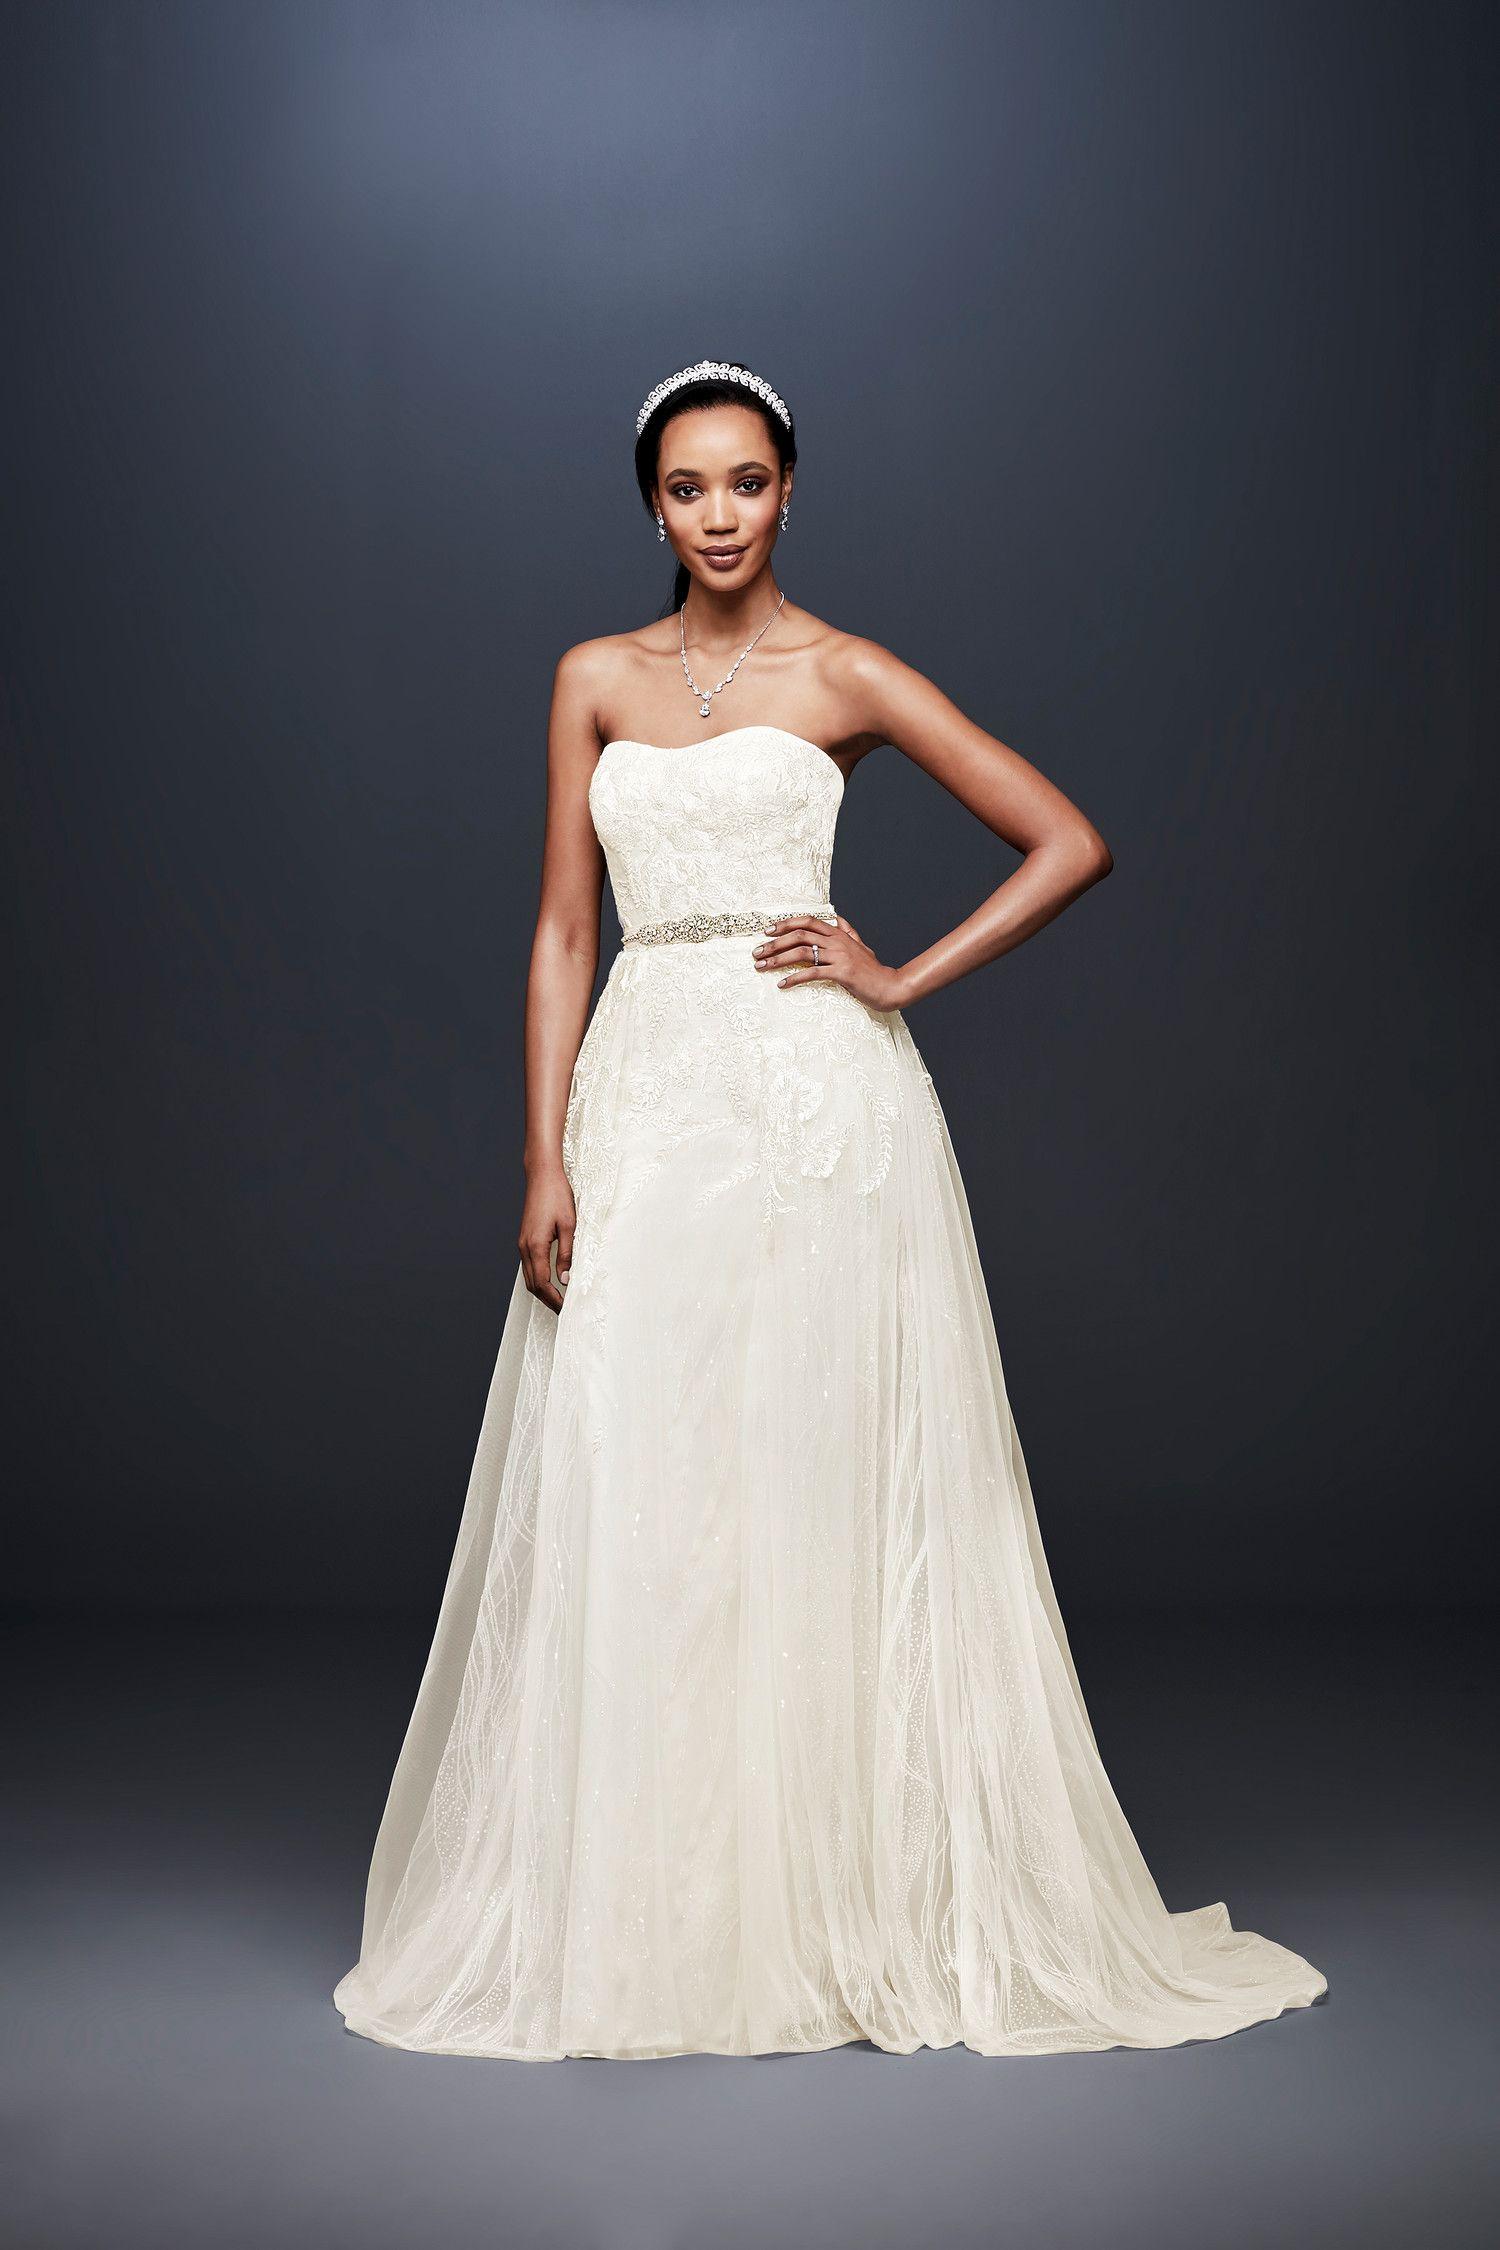 Davidus bridal fall wedding dress collection wedding dress